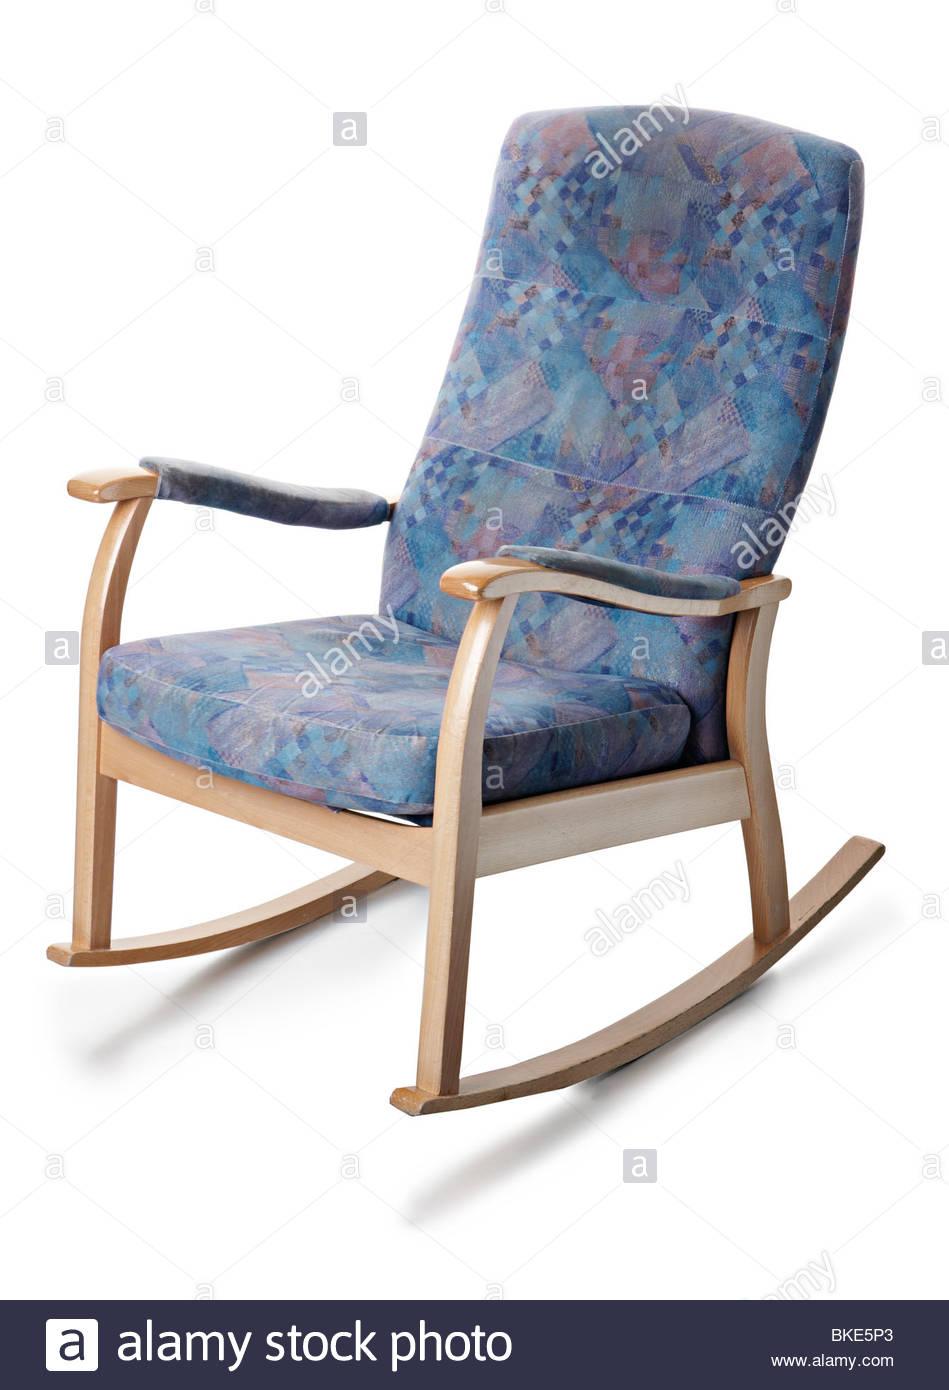 rocking chair - Stock Image